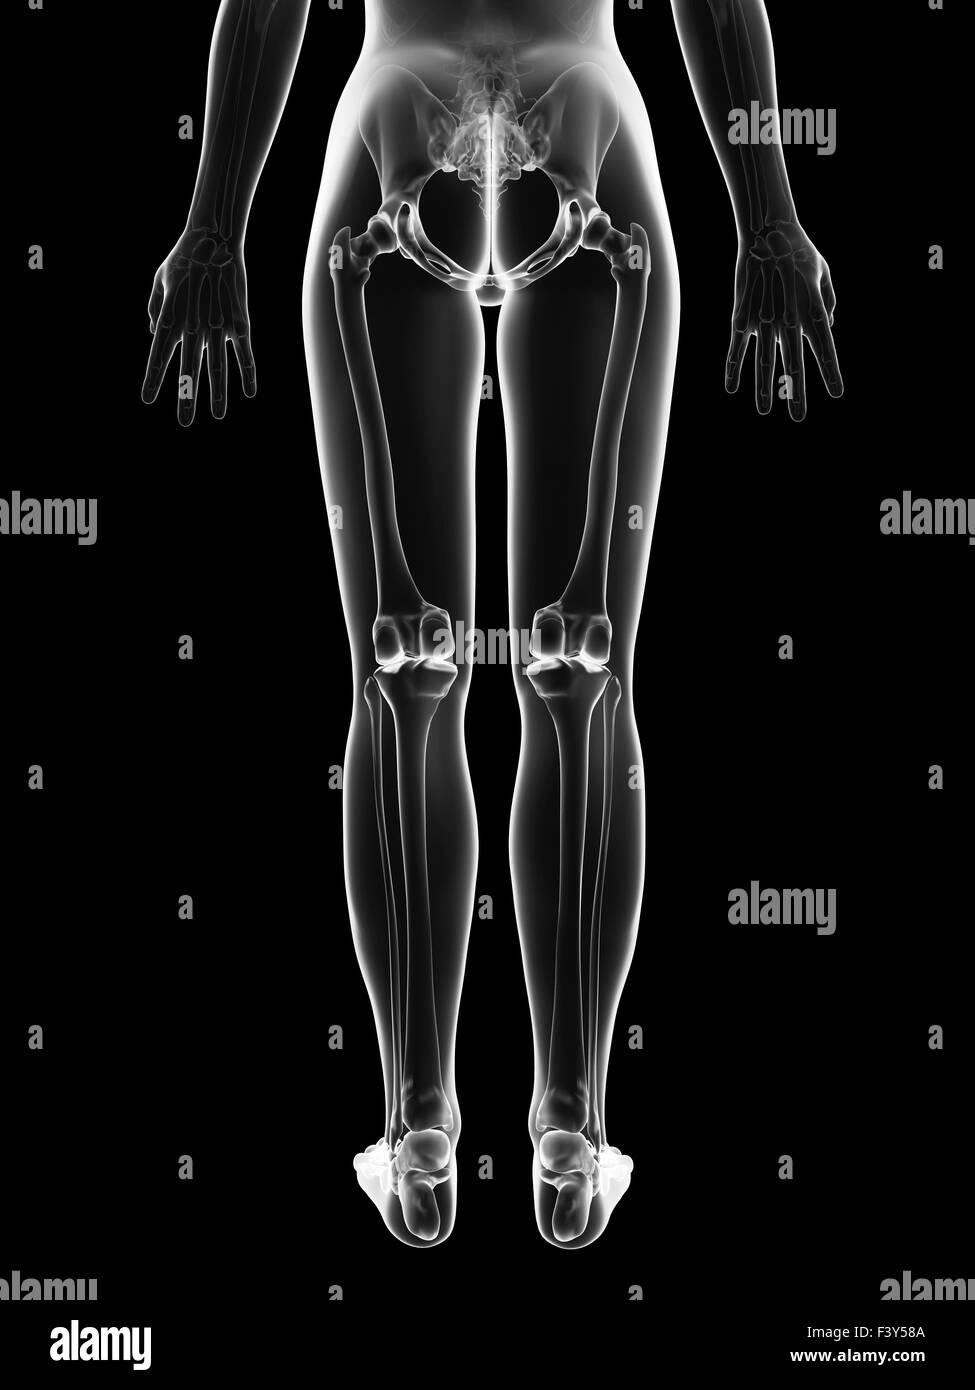 Transparent Female Skeleton Leg Bones Stock Photo 88492666 Alamy